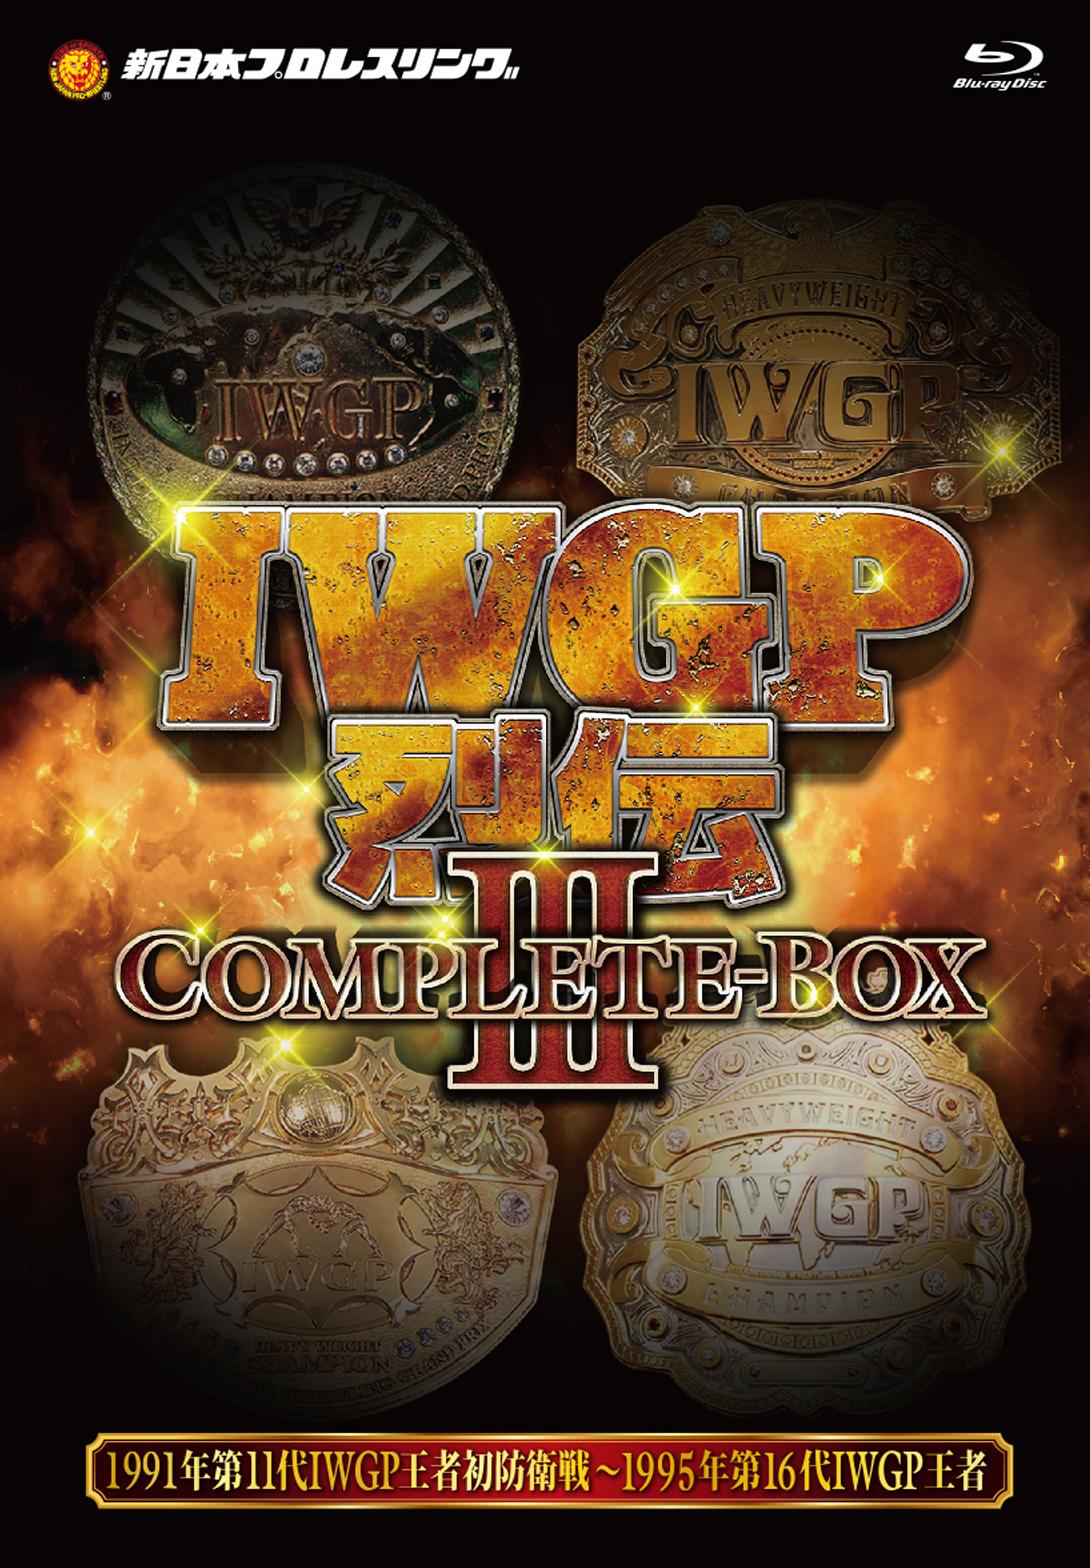 IWGP烈伝COMPLETE-BOX 3  1991年3月21日第11代IWGPヘビー級王者藤波辰爾初防衛戦~1995年4月16日第16代IWGPヘビー級王者橋本真也【Blu-ray-BOX】